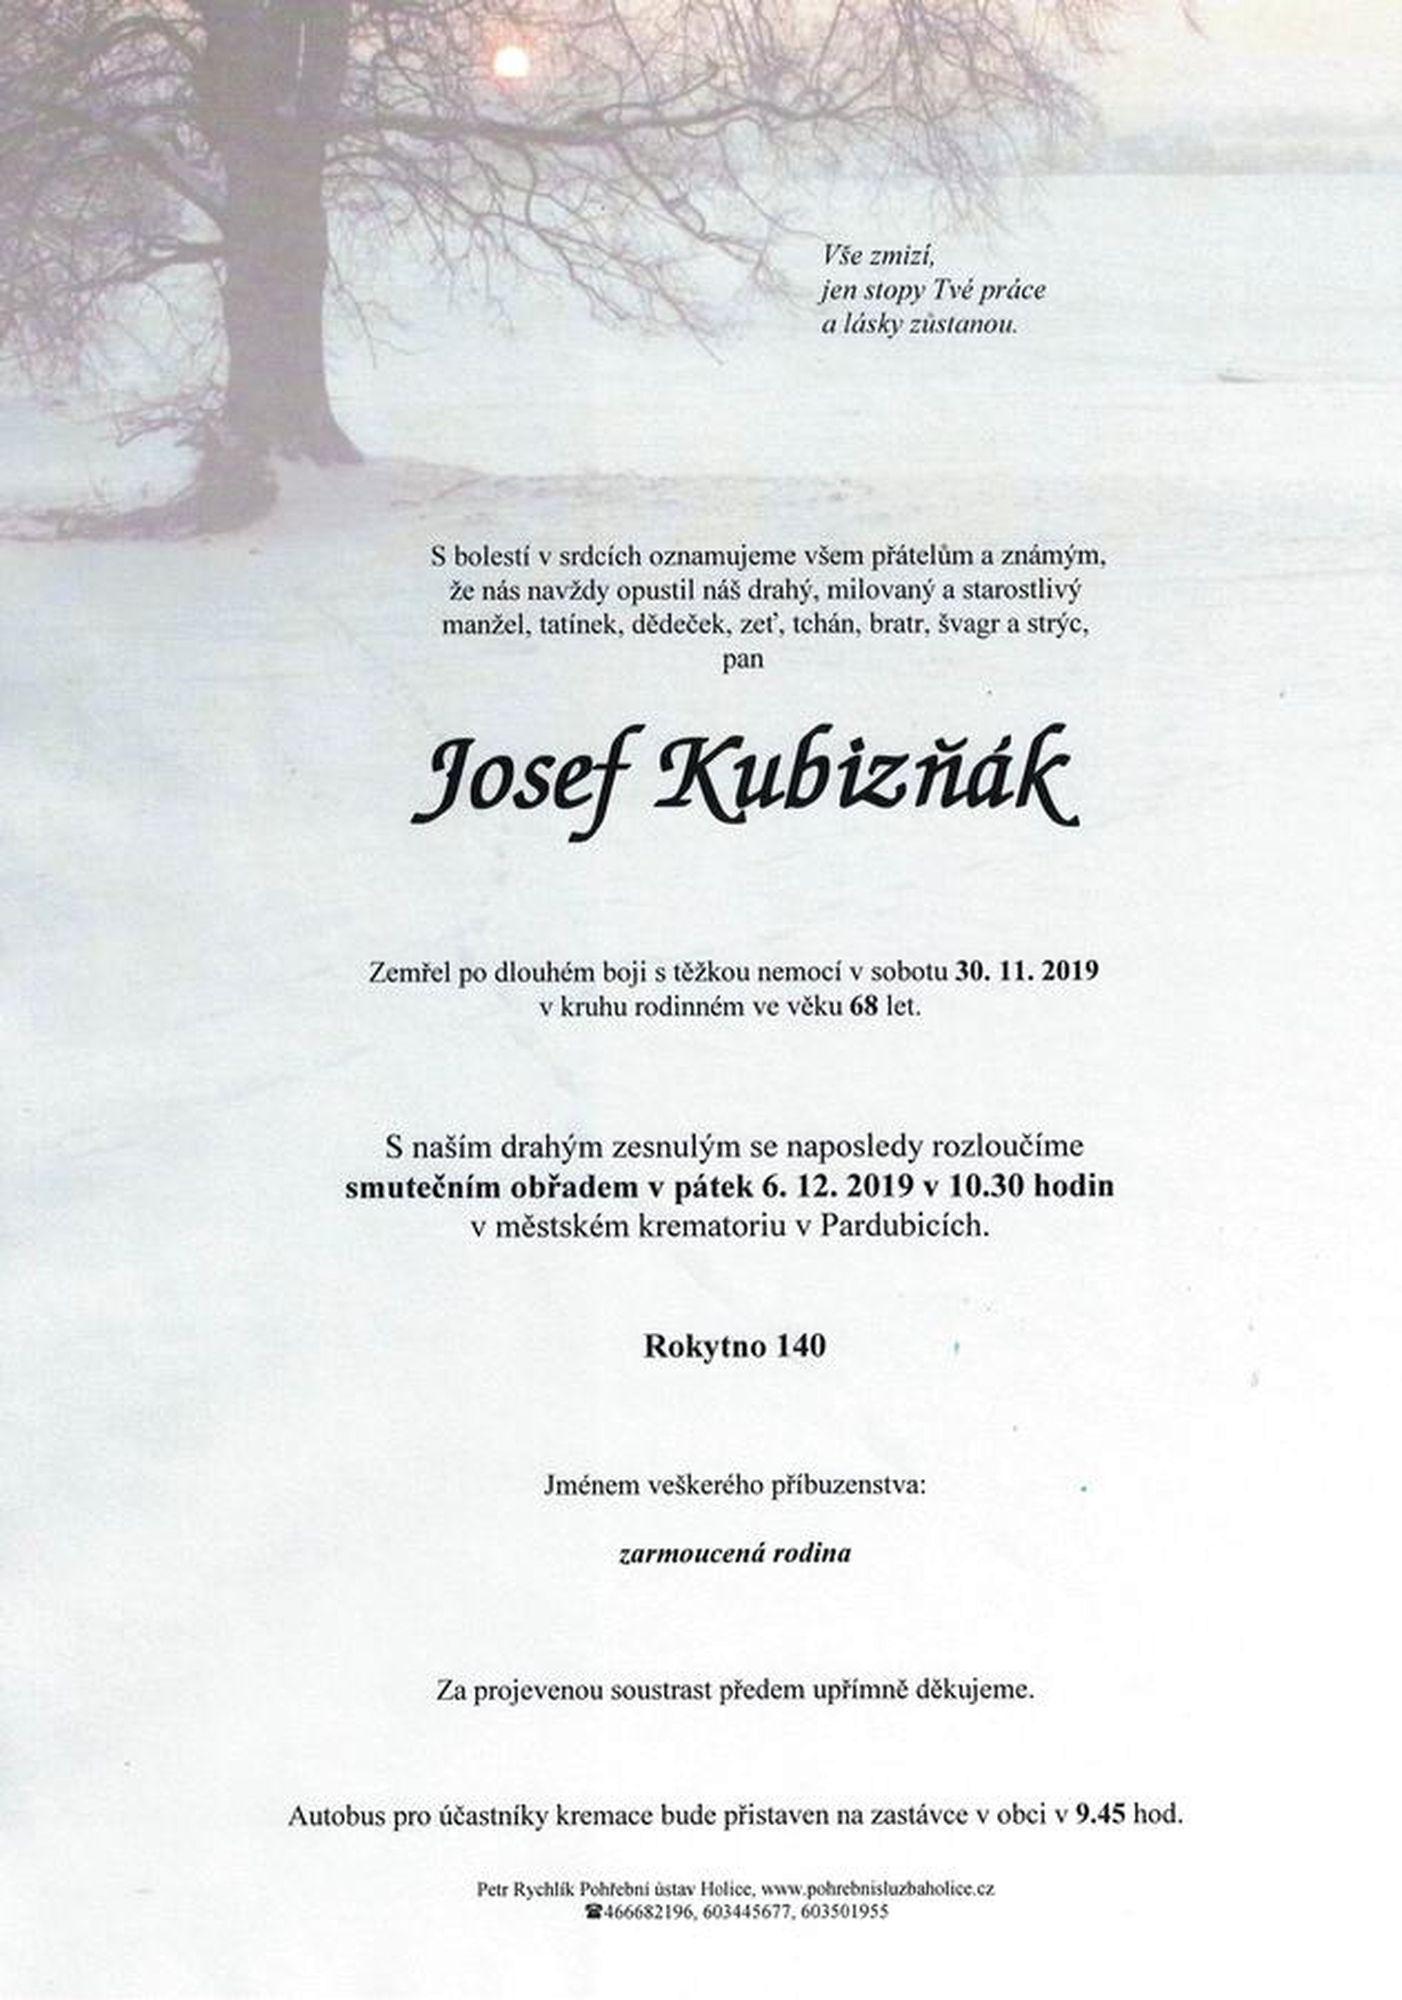 Josef Kubizňák